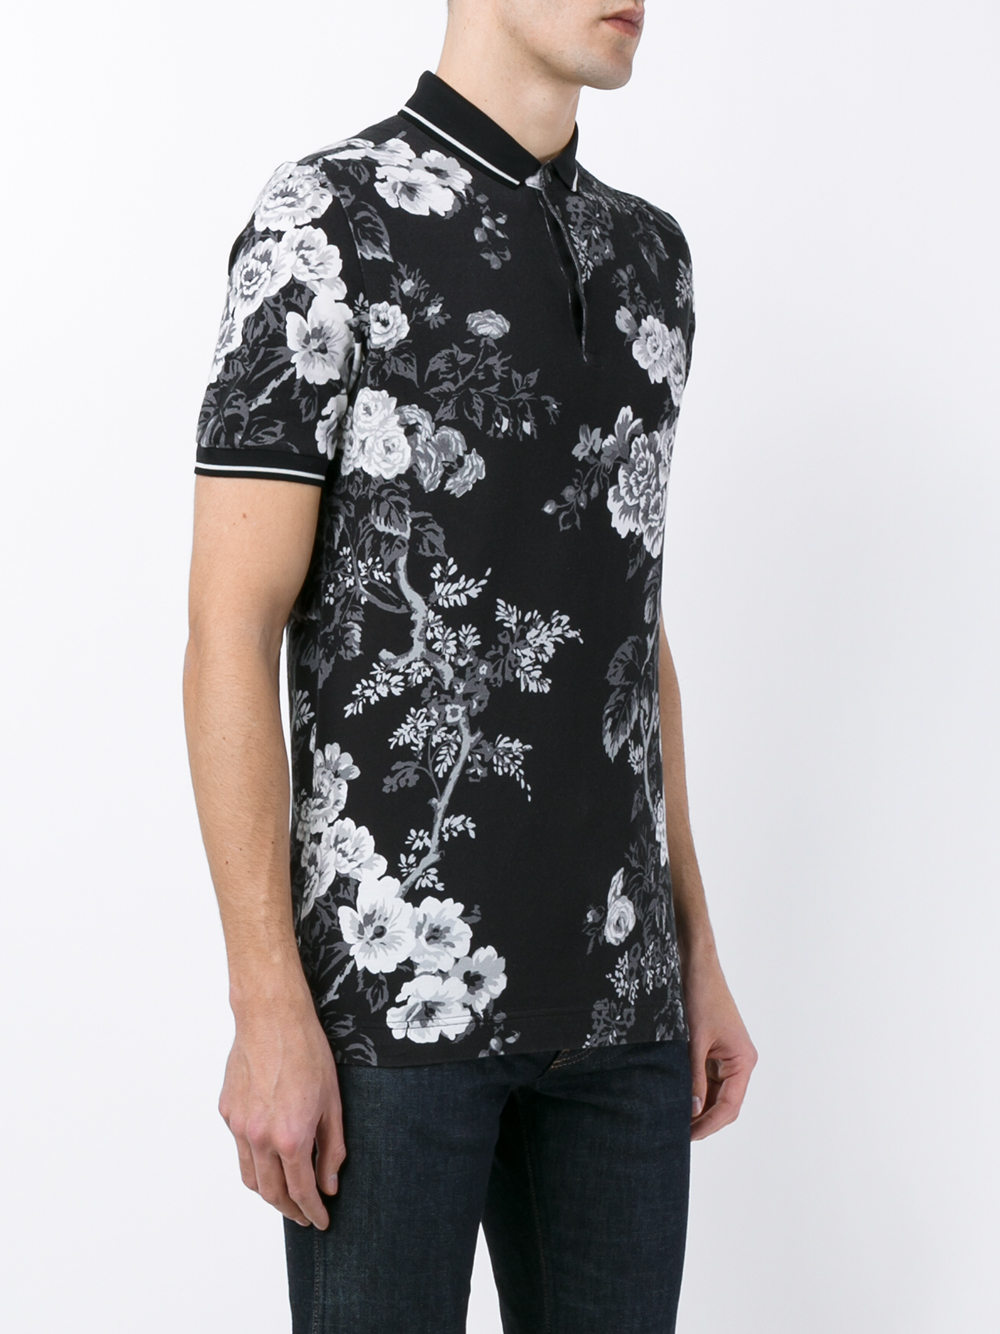 Floral Print Shirt Men